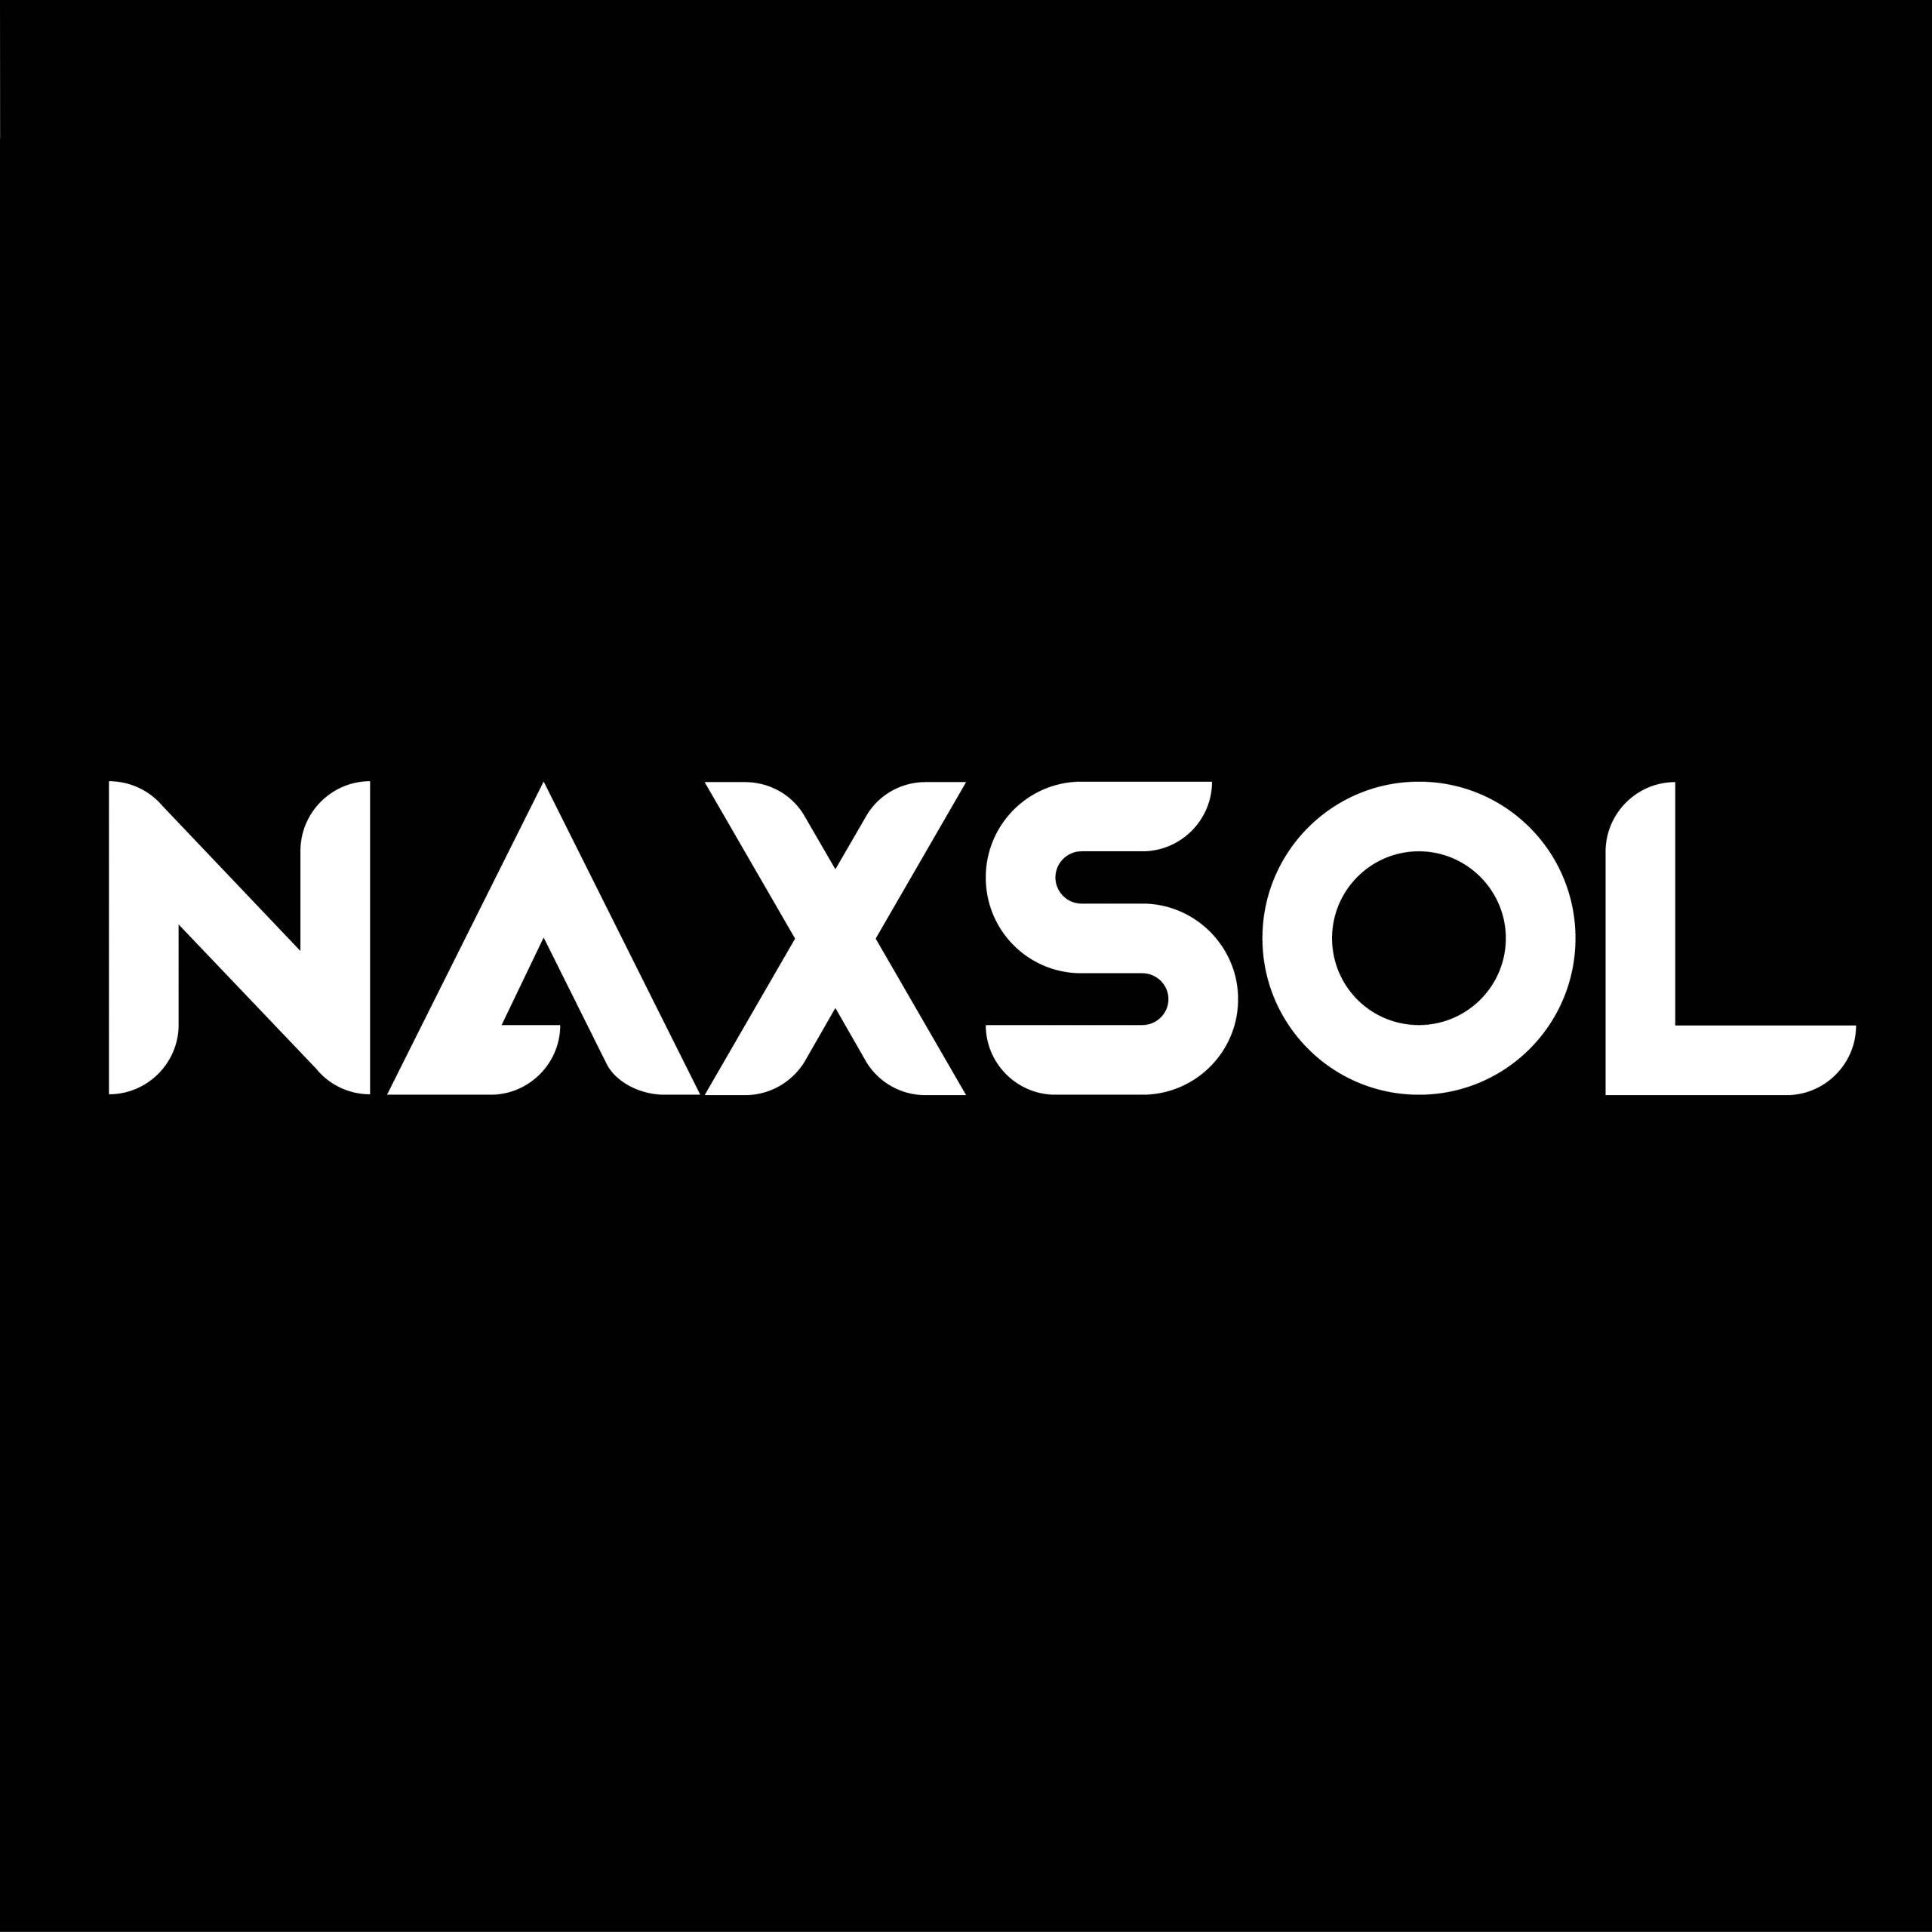 naxsol - brand logo design - corporate branding